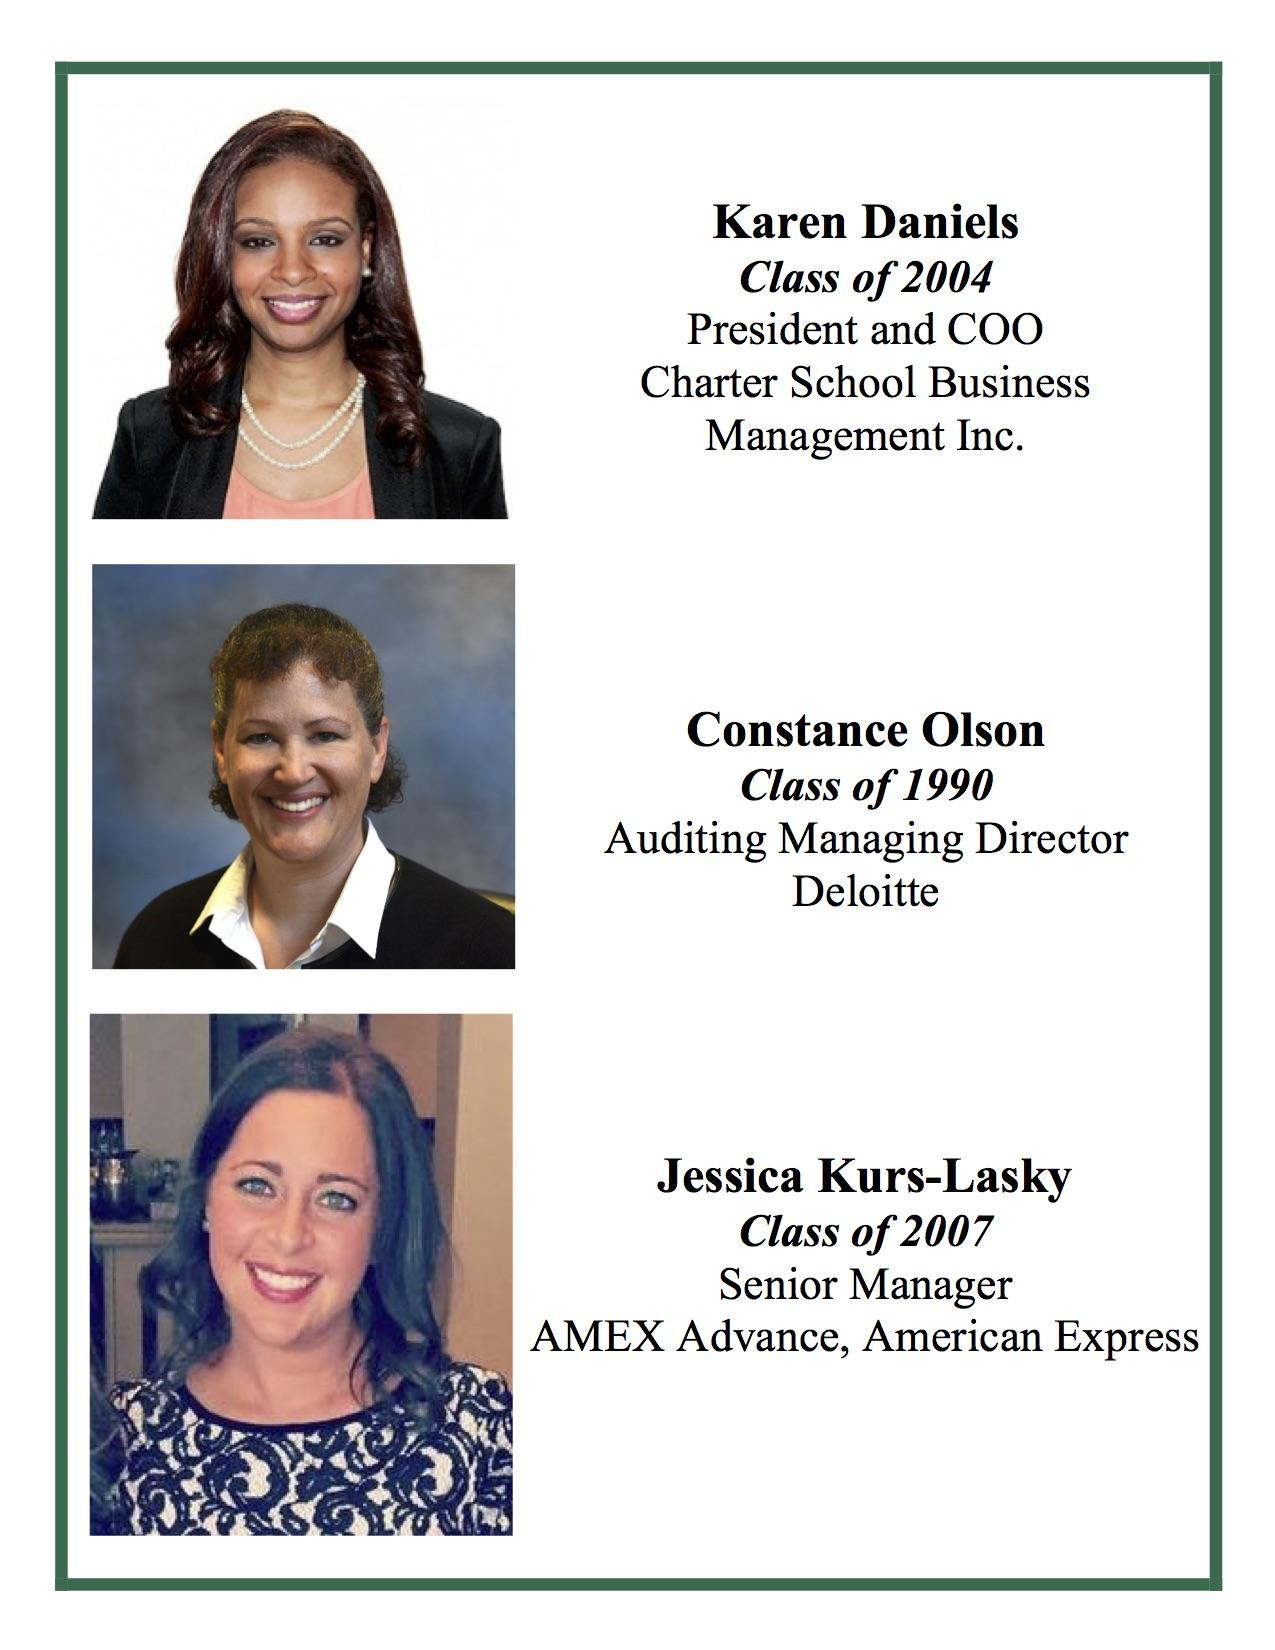 Binghamton_University_s_Women_in_Business_Winter_Women_s_Panelists1.jpg